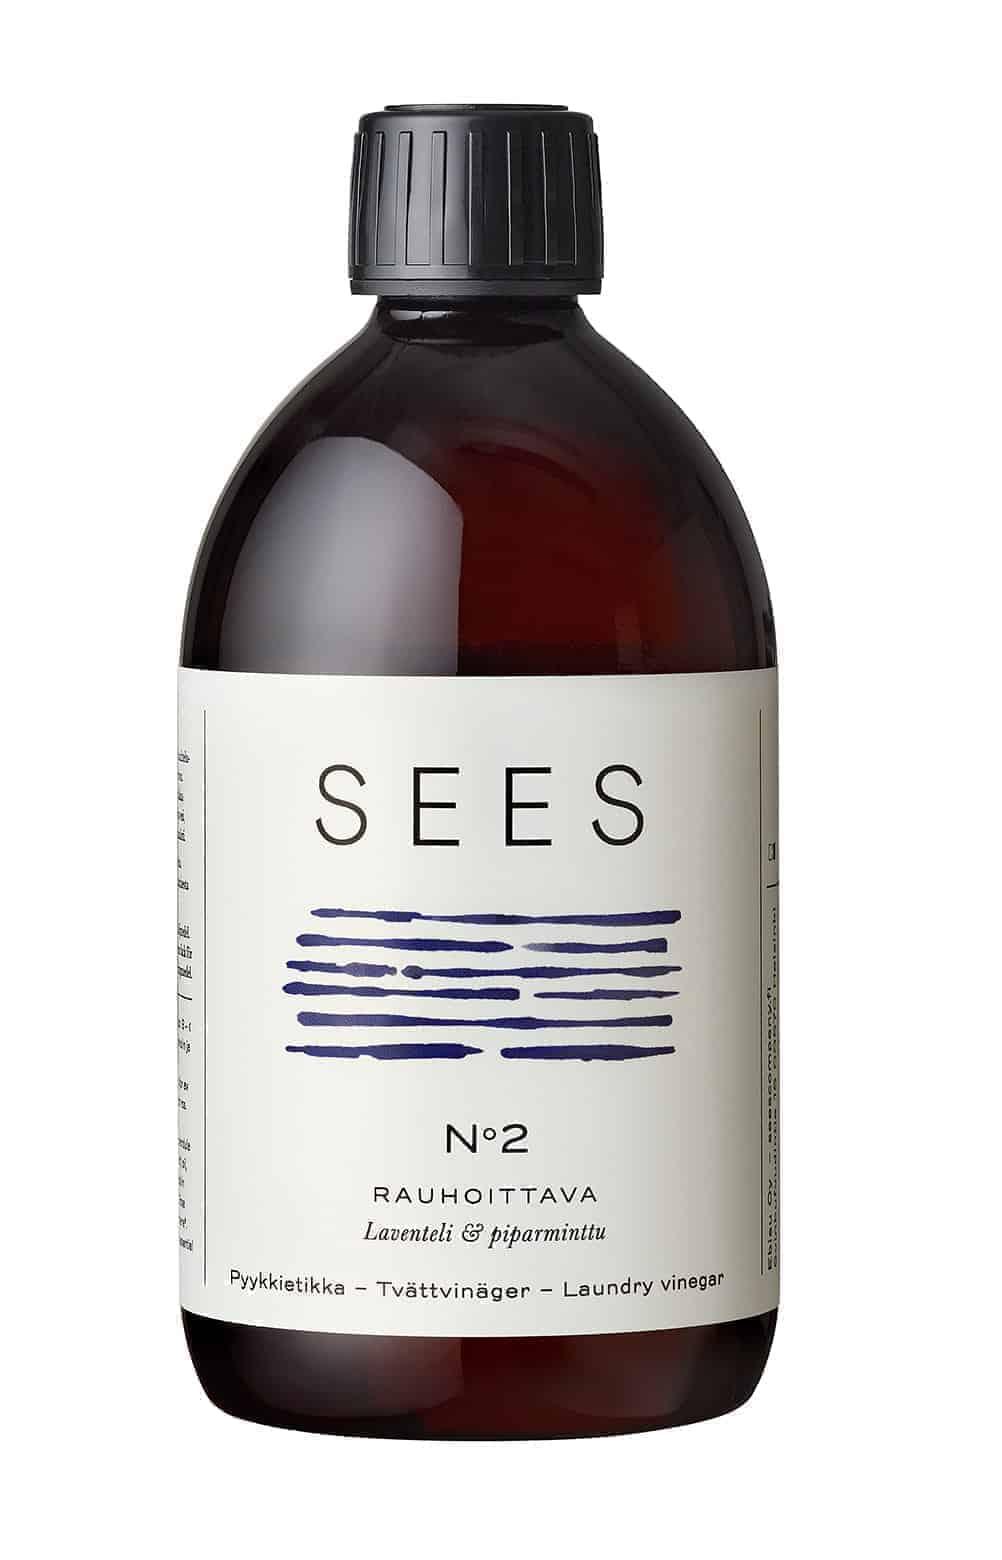 Pyykkietikka laventeli & piparminttu biohajoava Sees company